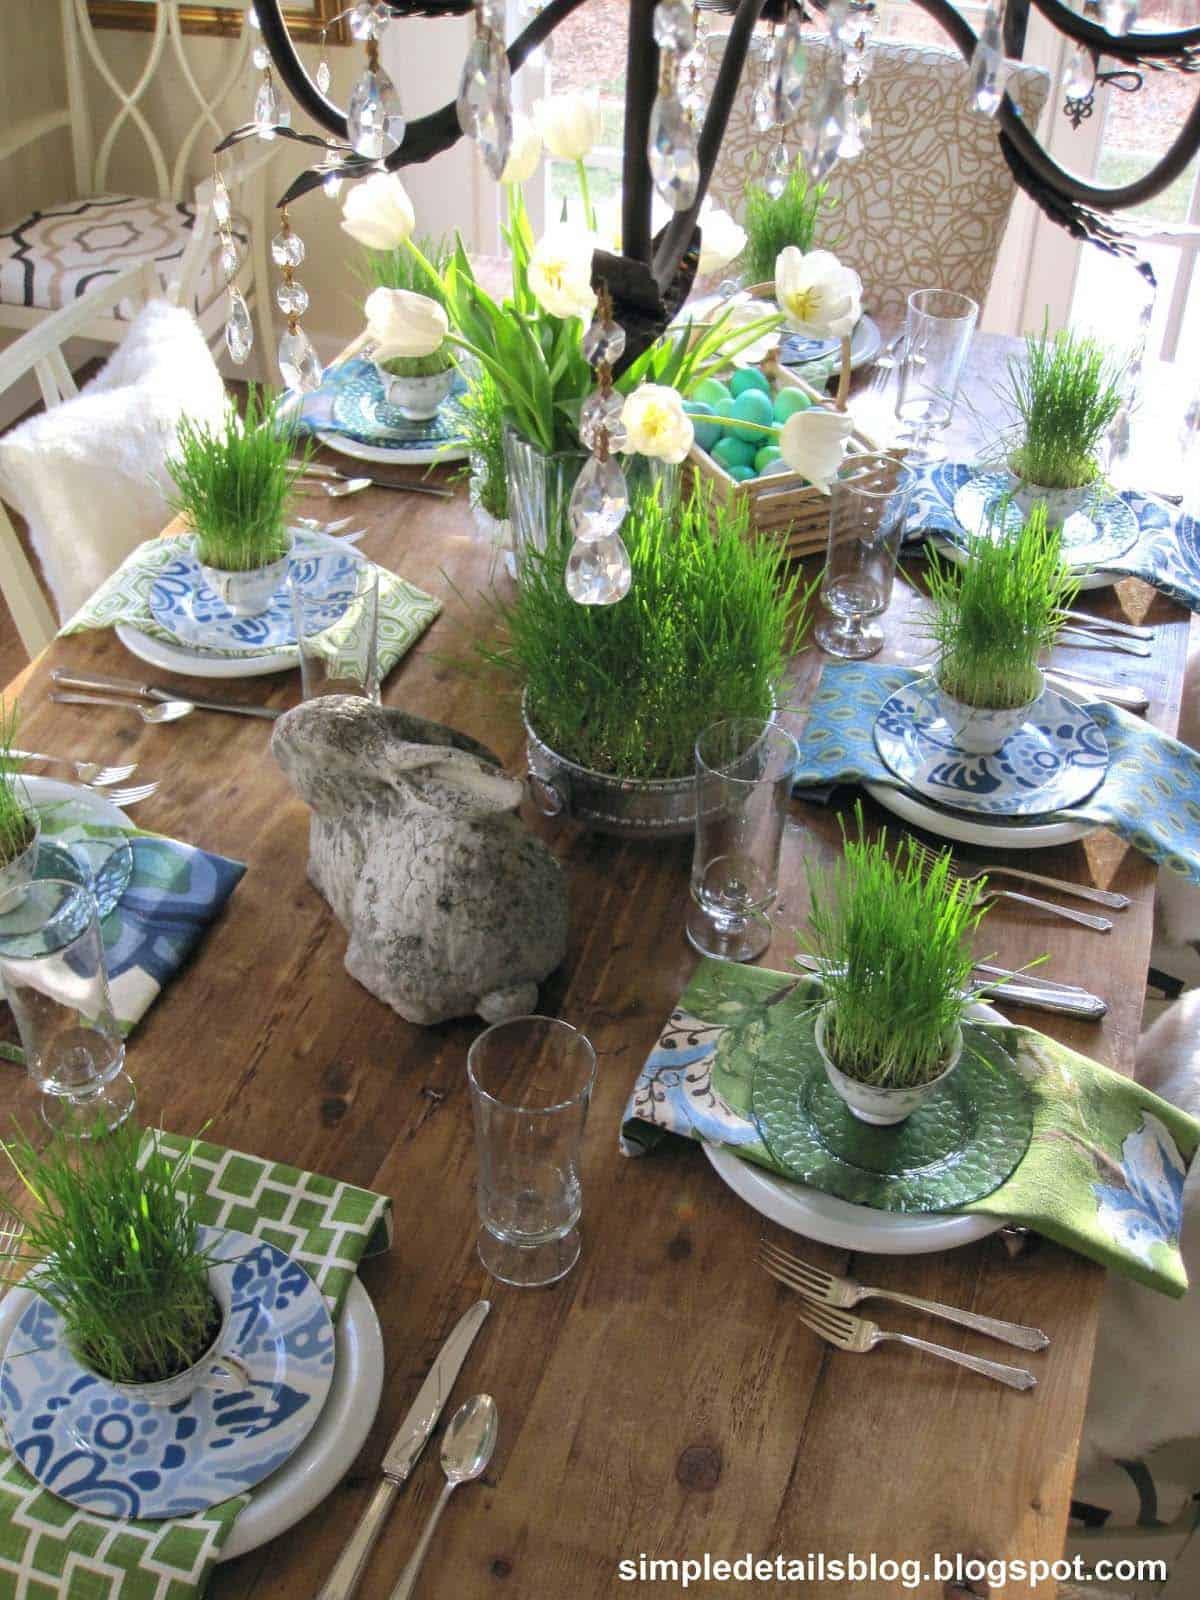 Inspiring Easter Table Centerpiece Ideas-16-1 Kindesign